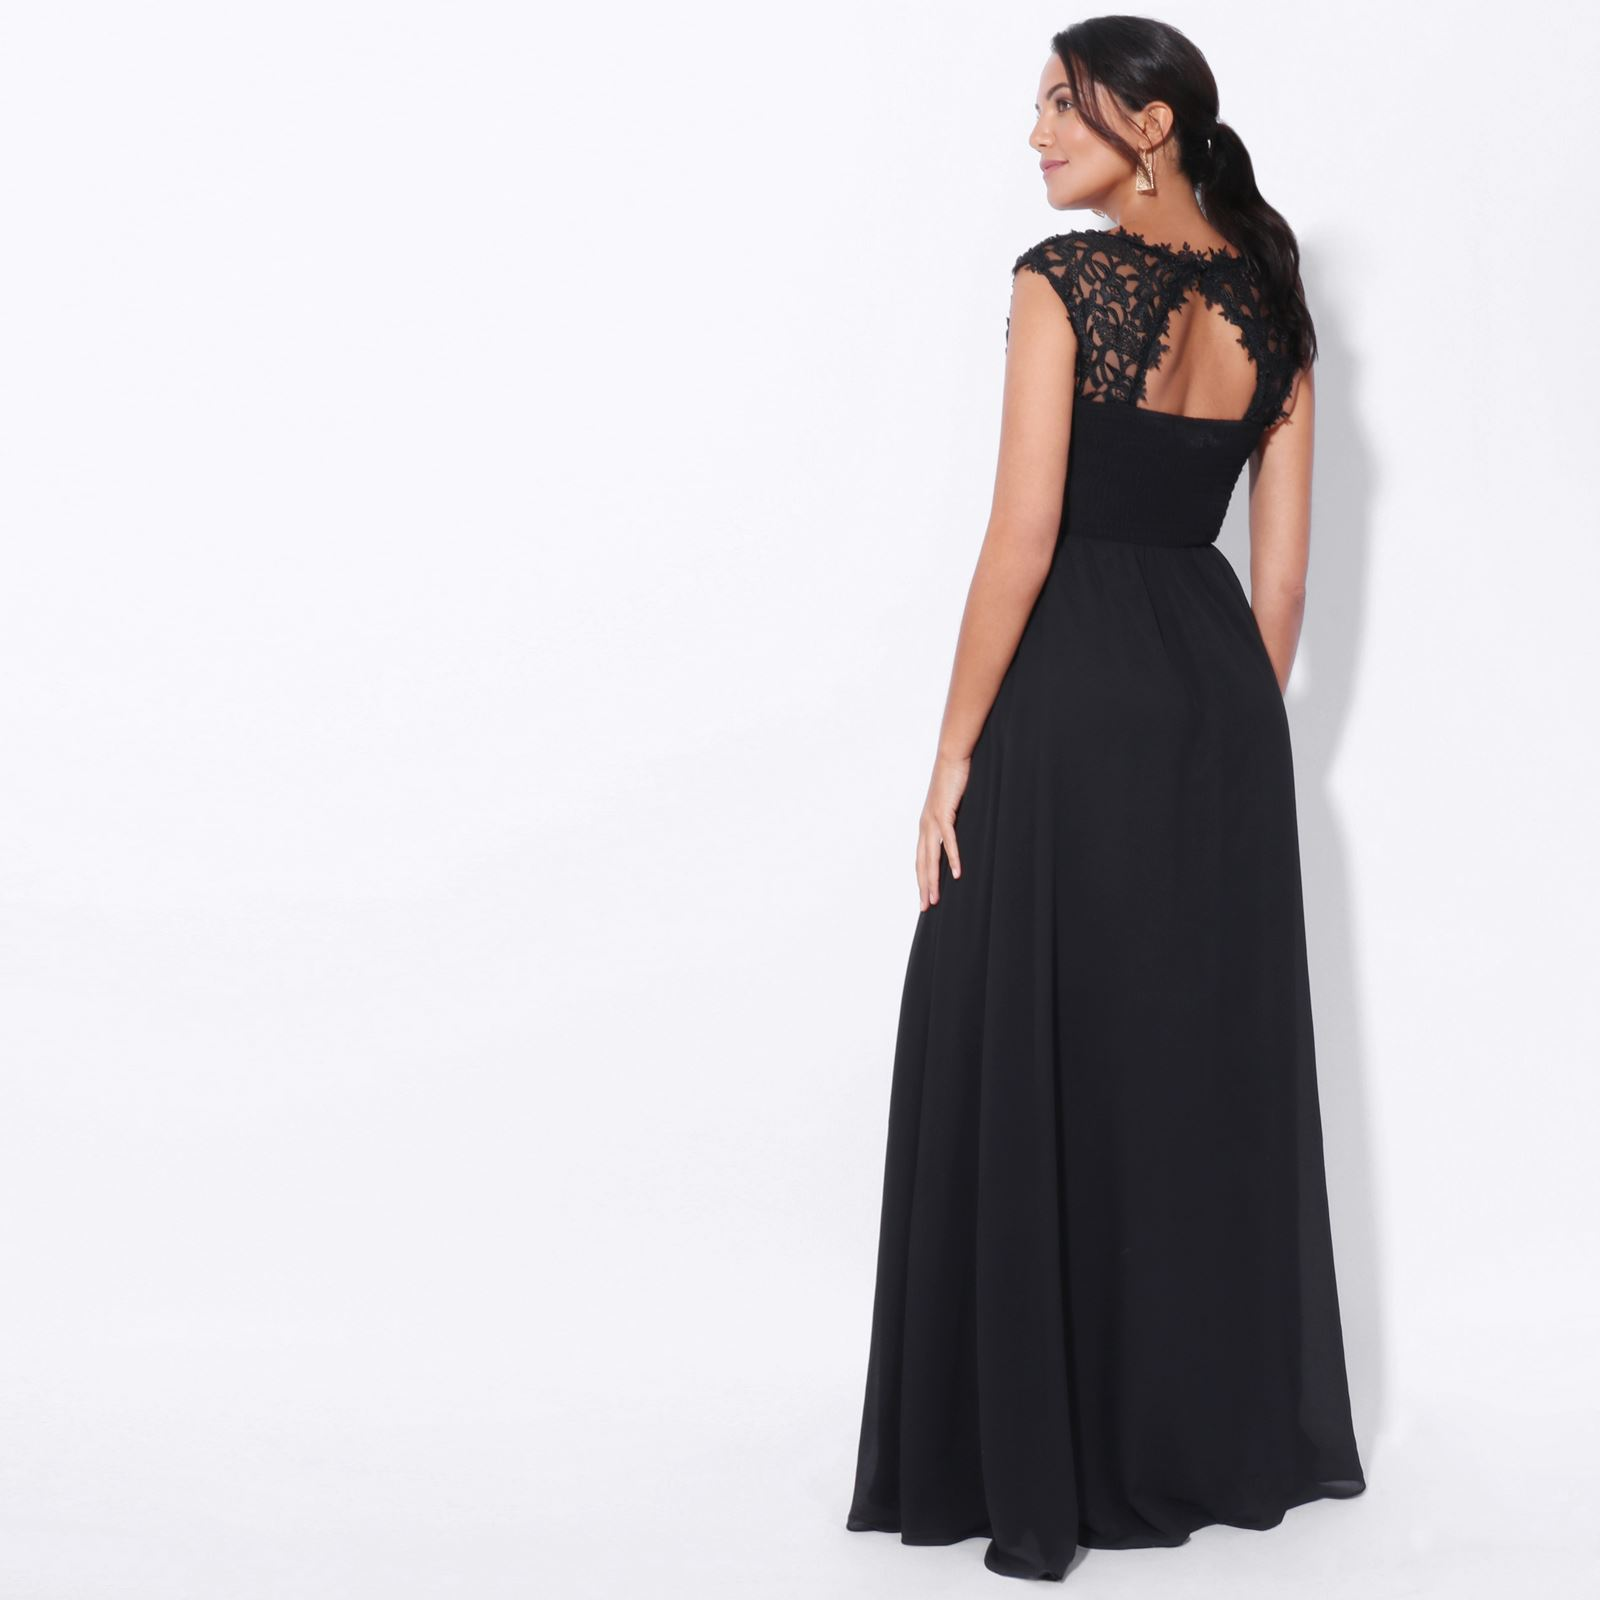 Womens-Wedding-Bridesmaid-Prom-Dress-Formal-One-Off-Shoulder-Long-Evening-8-18 thumbnail 11